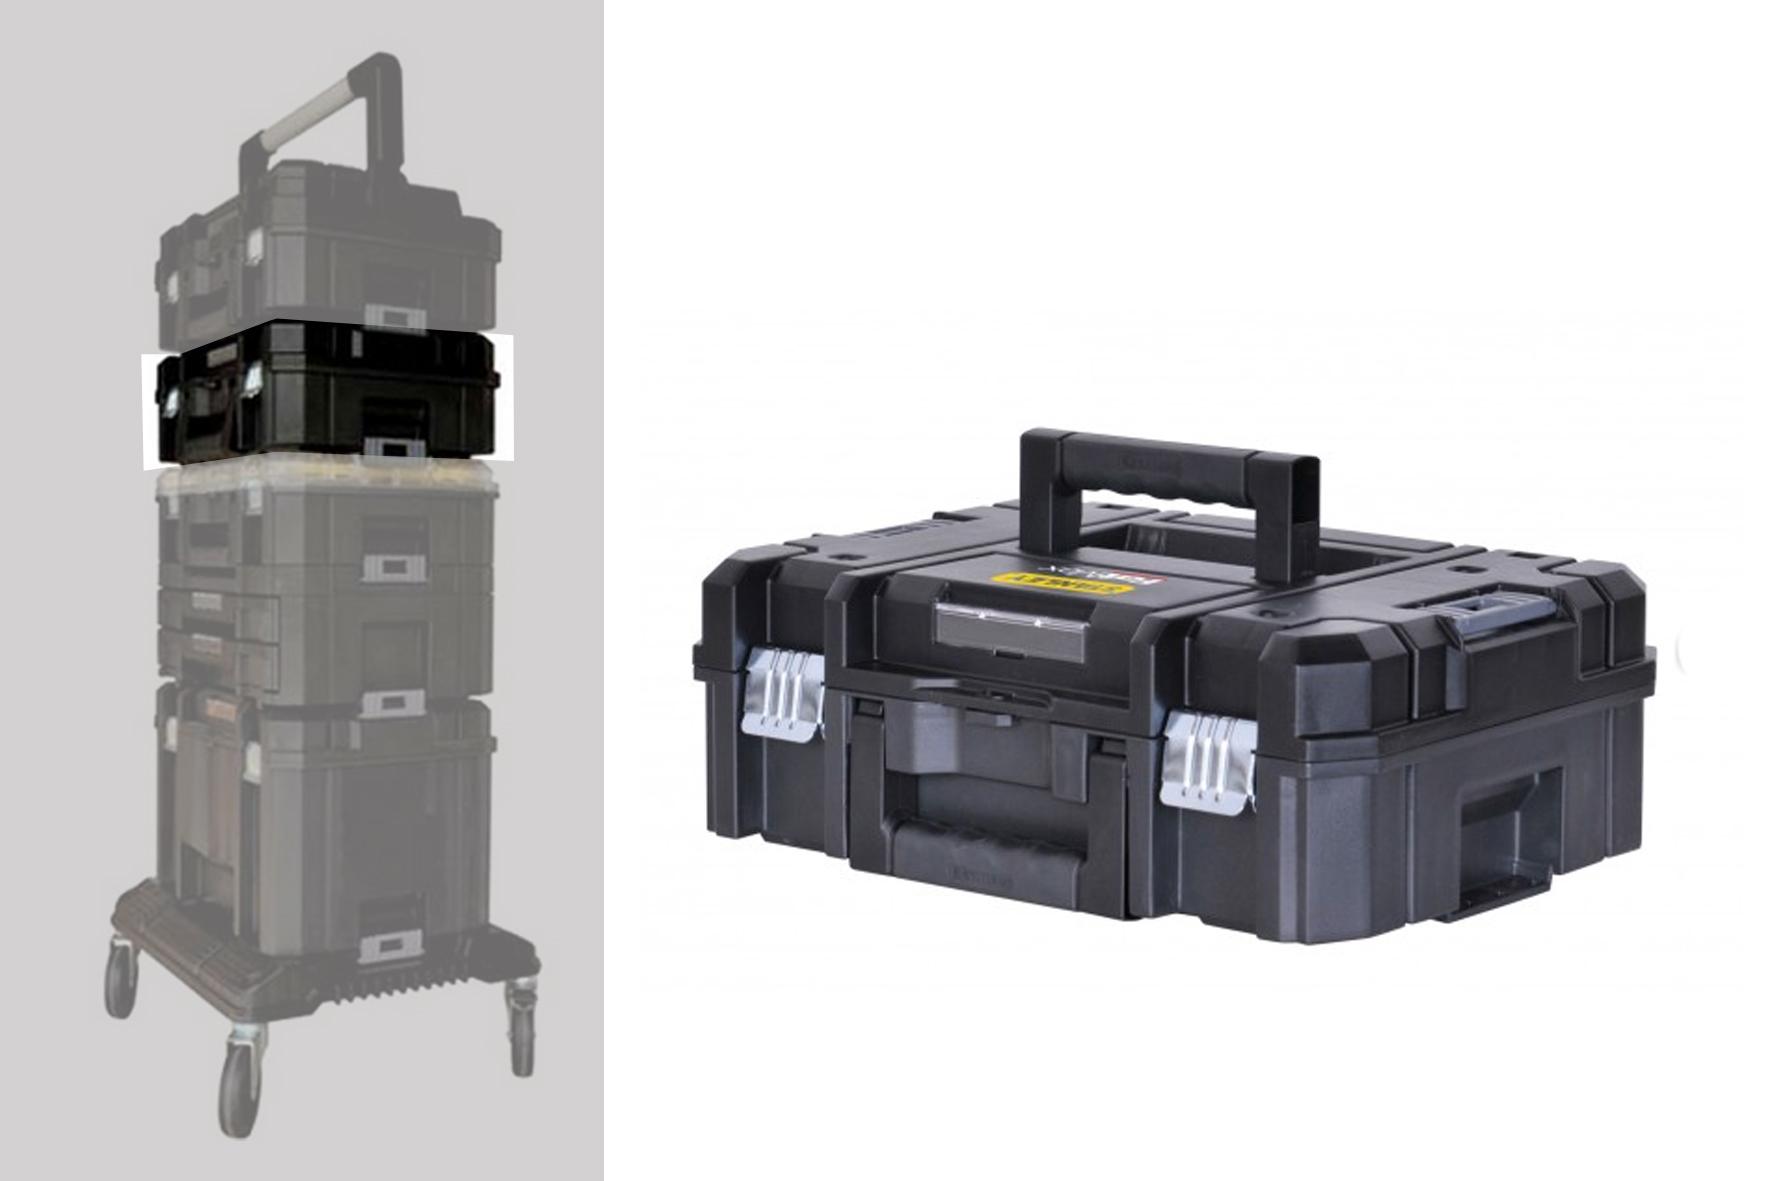 bo te outils tstak ii achat en ligne ou dans notre magasin. Black Bedroom Furniture Sets. Home Design Ideas